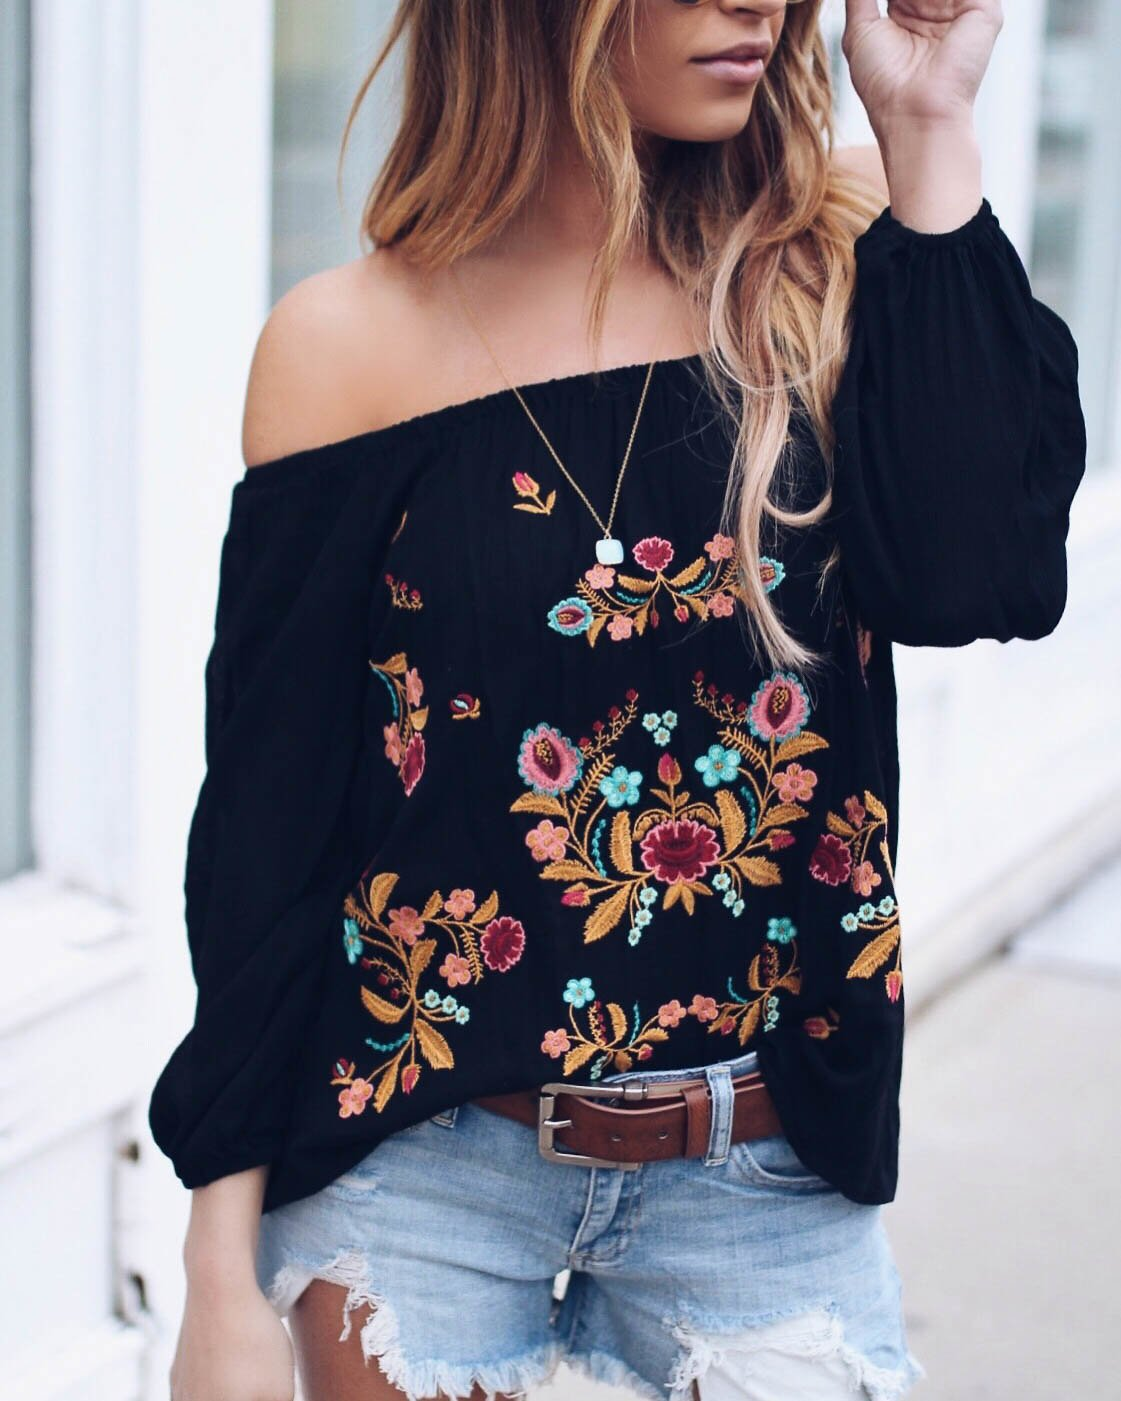 women blouse fashion 2020  female womens top shirt embroidery casual lantern sleeve elegant  popular ladies clothing top 90s